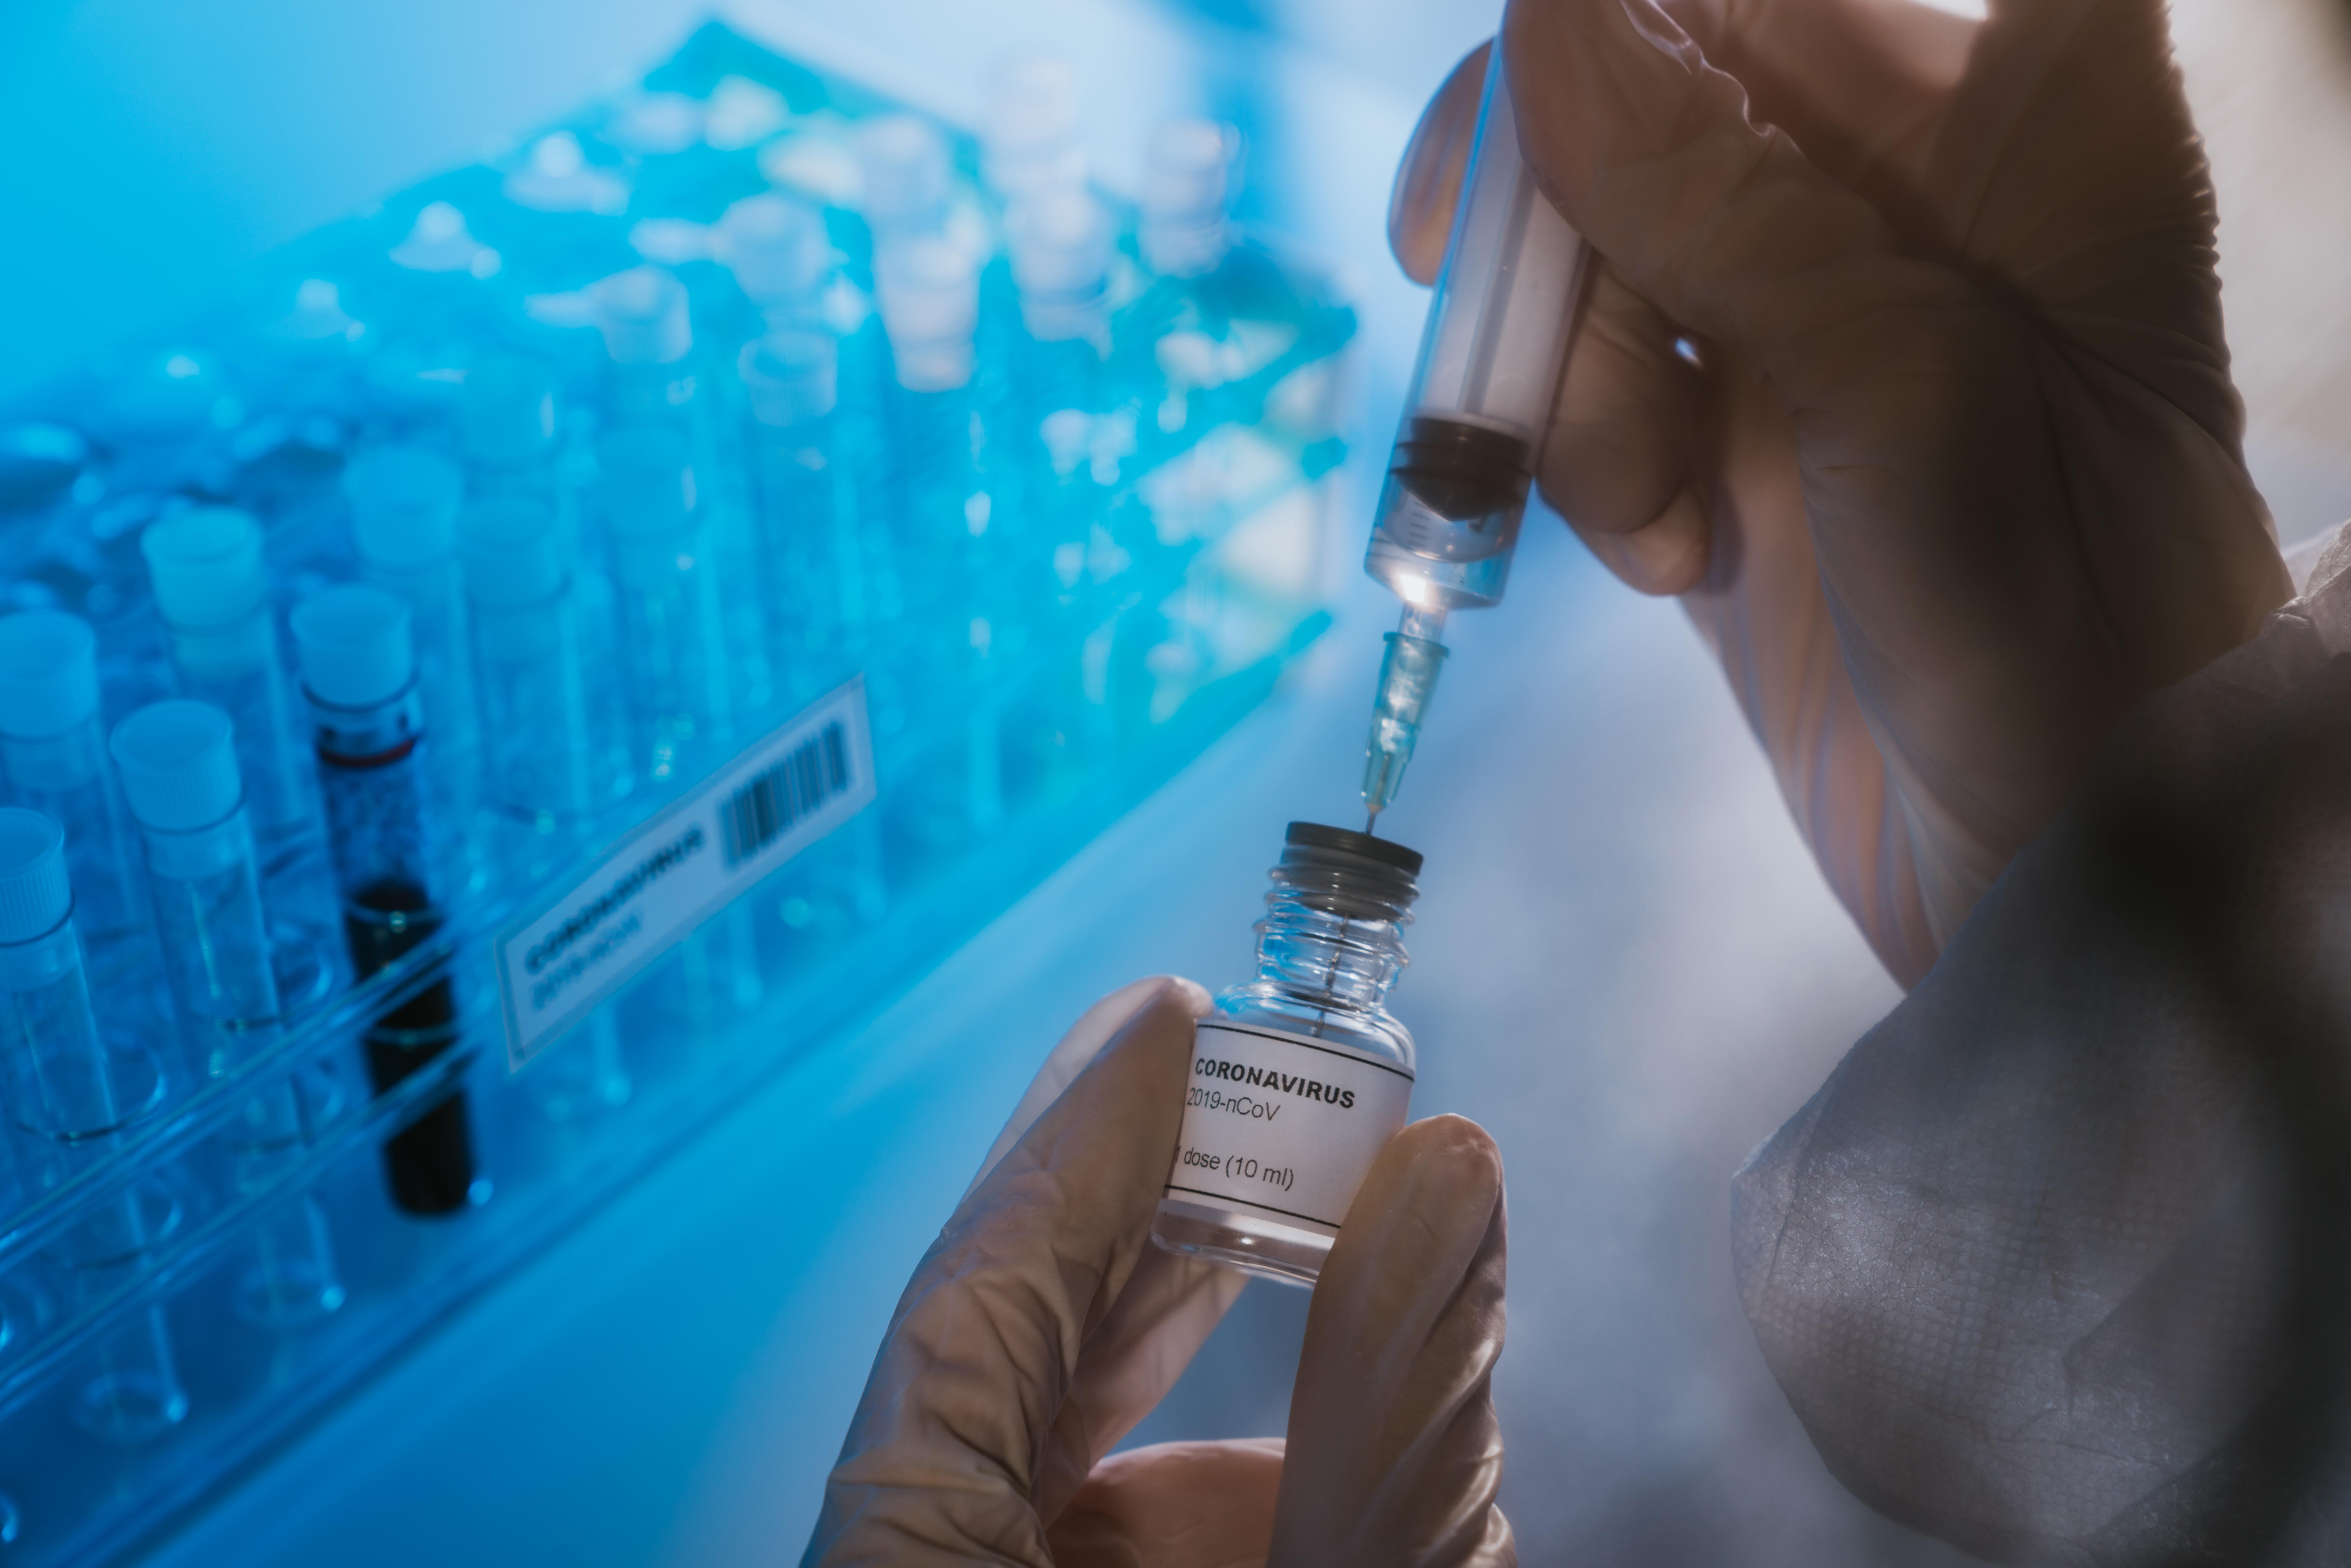 201125-covid-19-vaccine-getty-1214508941.jpg